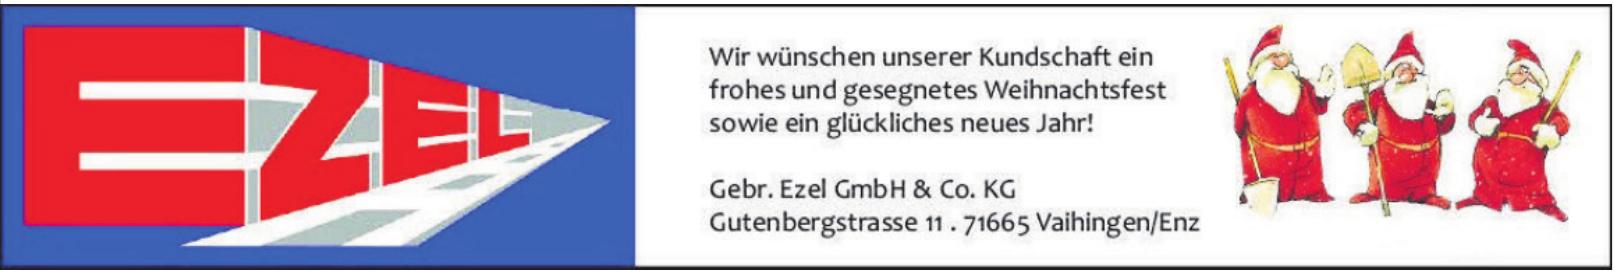 Gebr. Ezel GmbH & Co. KG